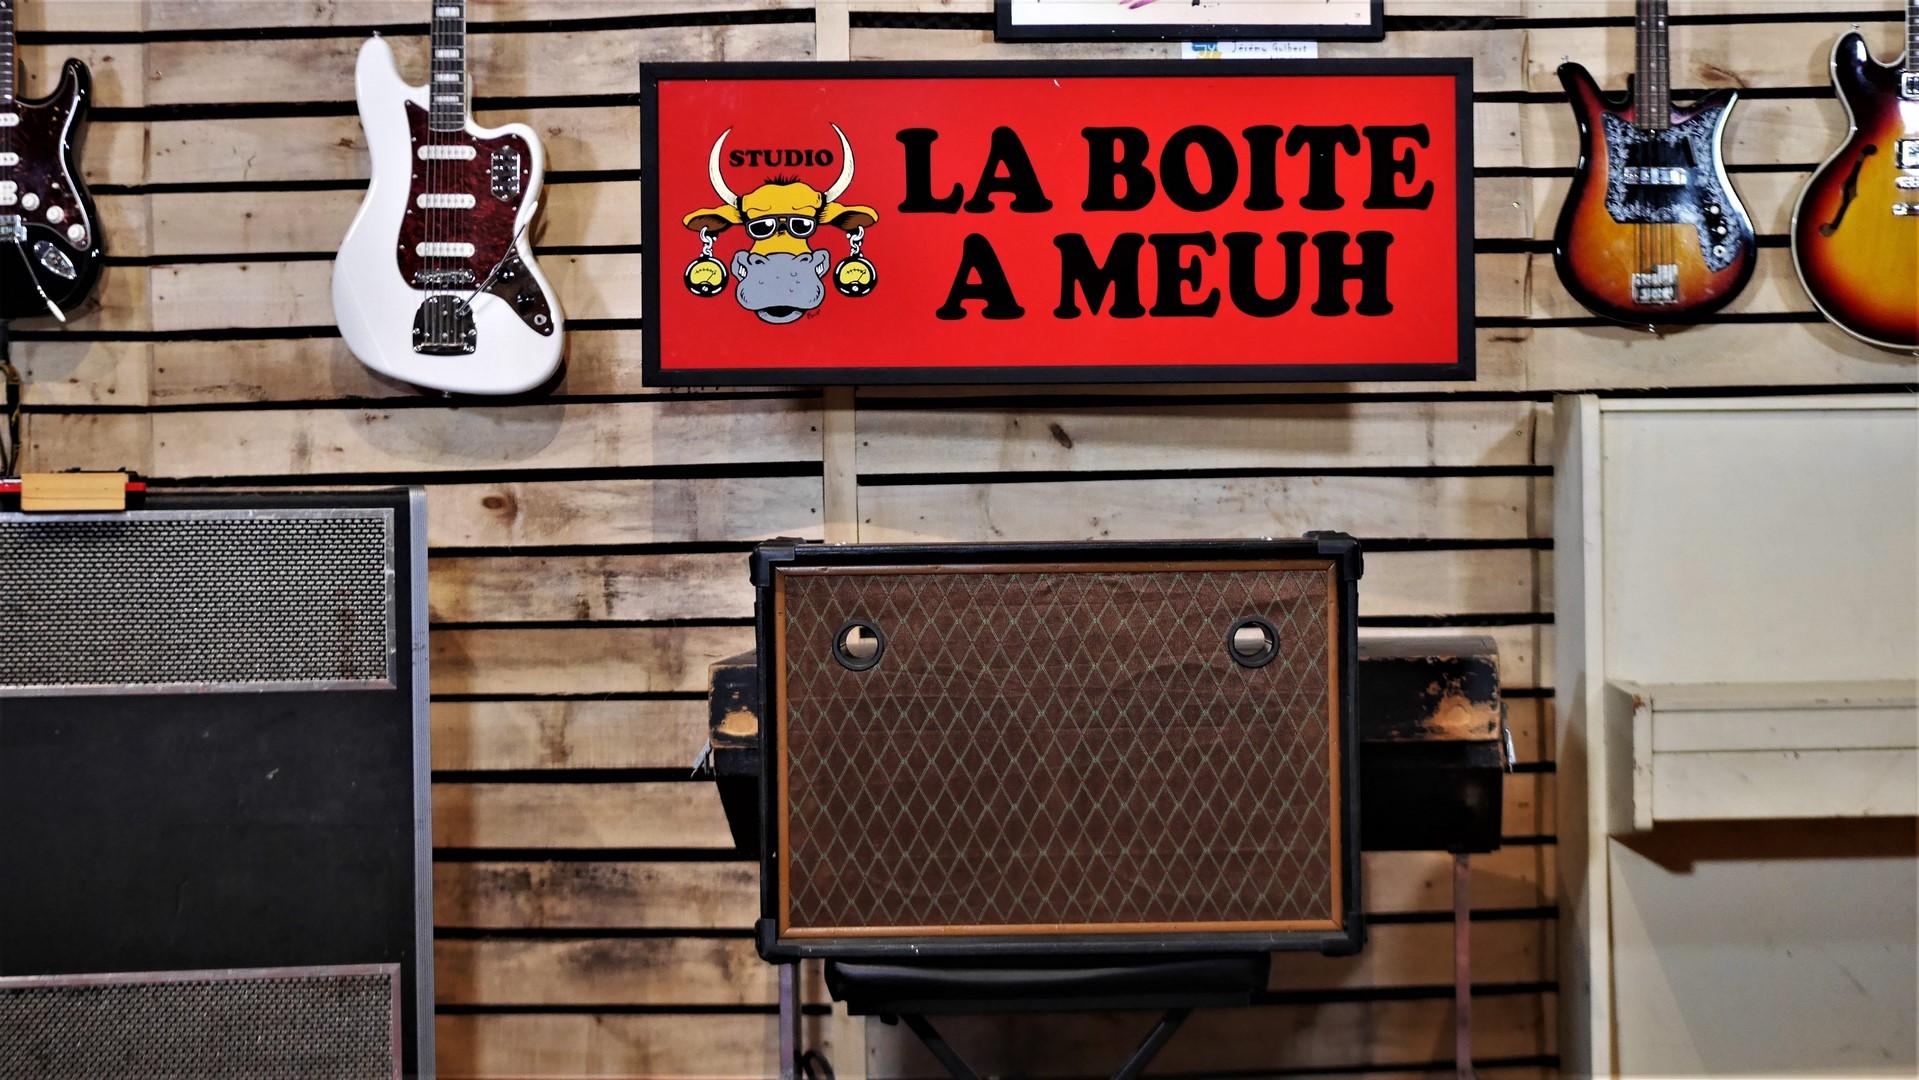 studio-la-boite-a-meuh-baffle-2x12-v30